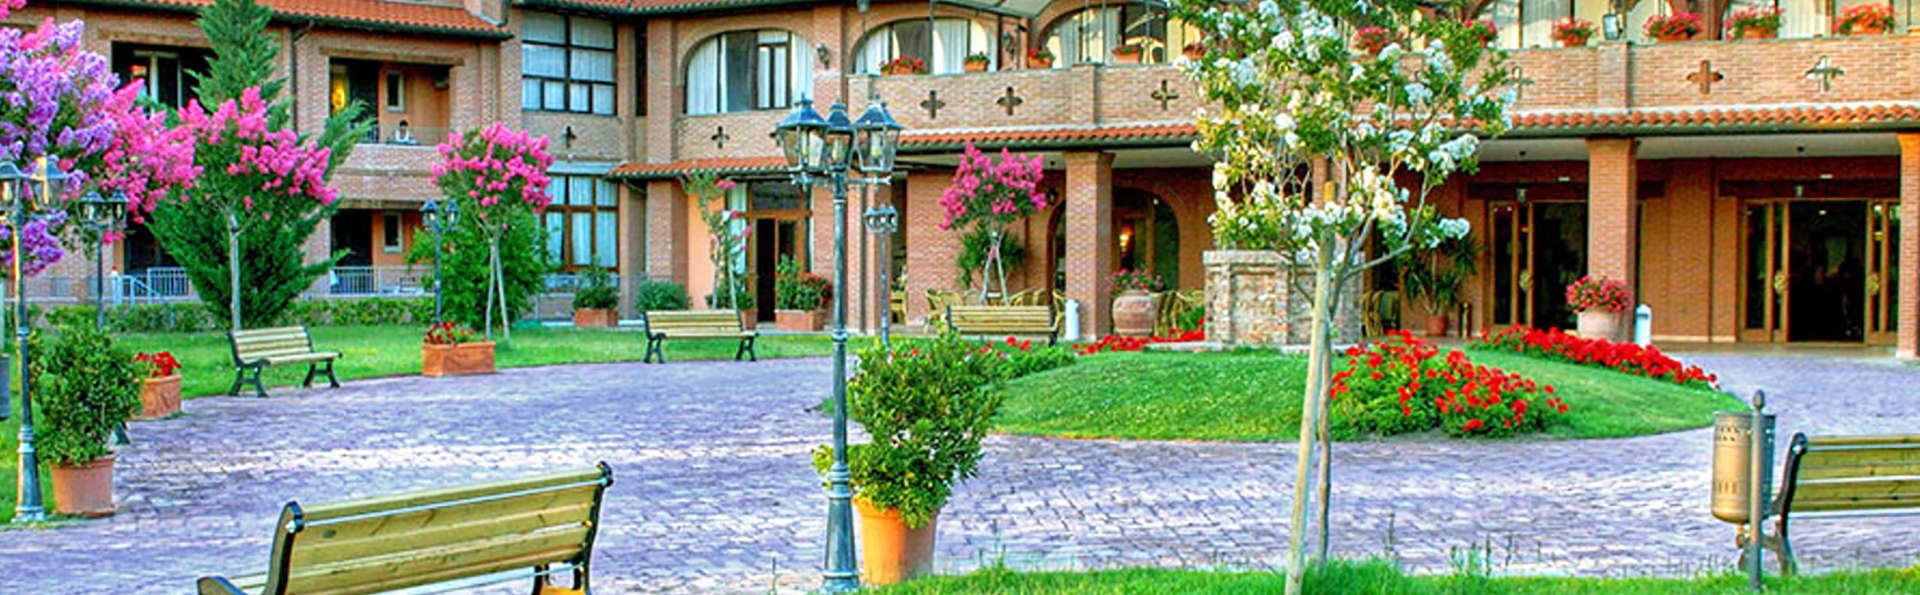 Hotel Fattoria La Principina - edit_front.jpg